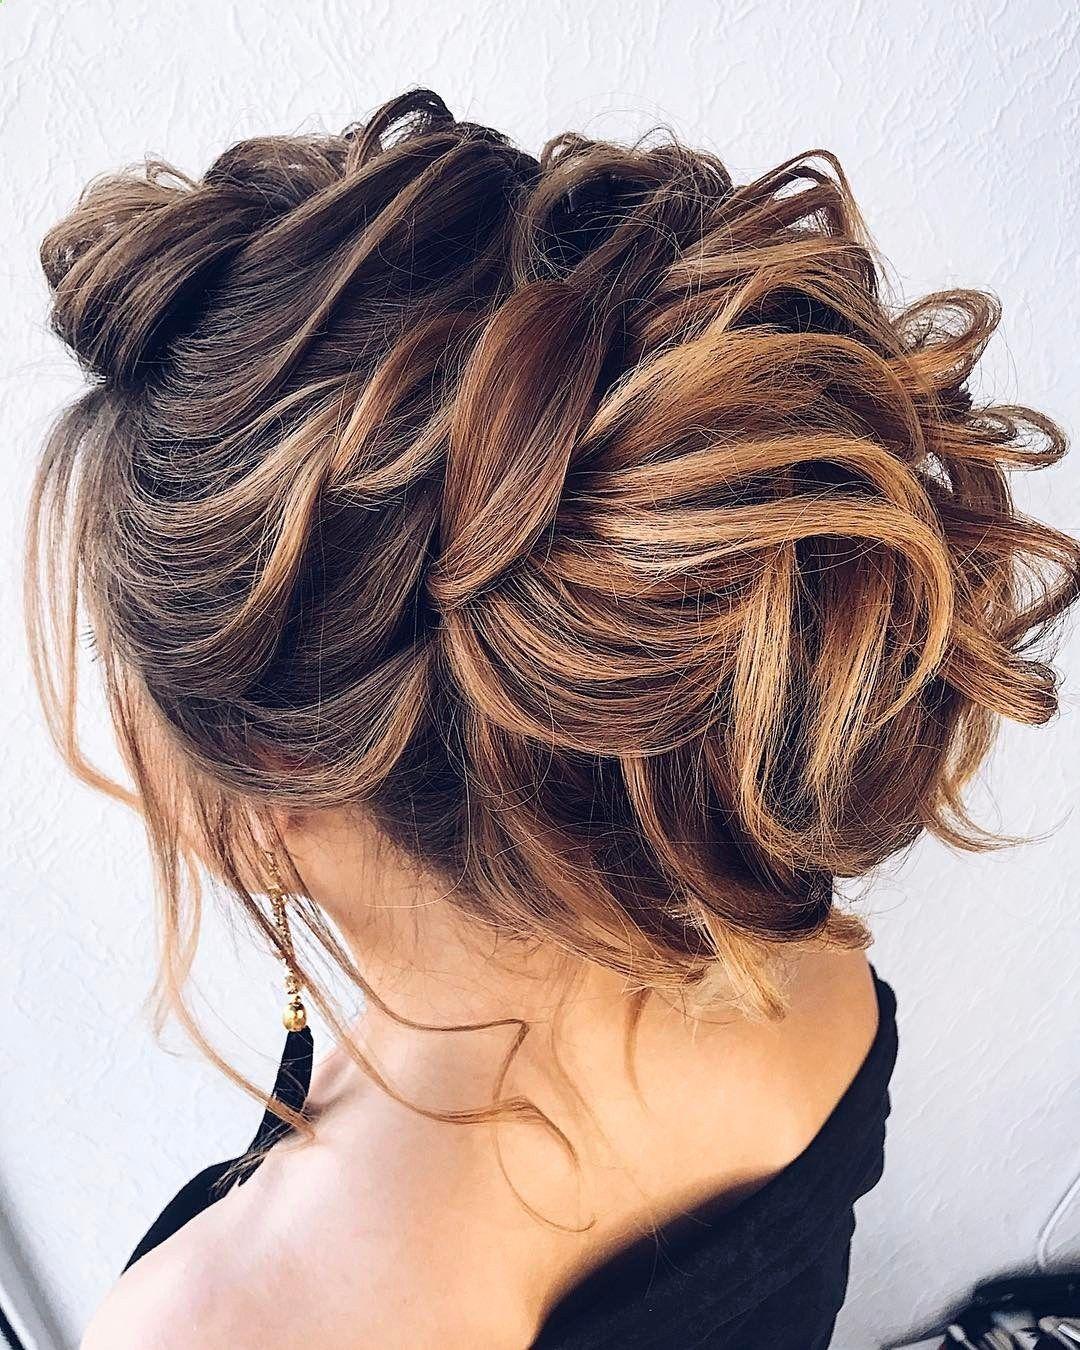 Pin by allison on braid pinterest hair hair styles and wedding